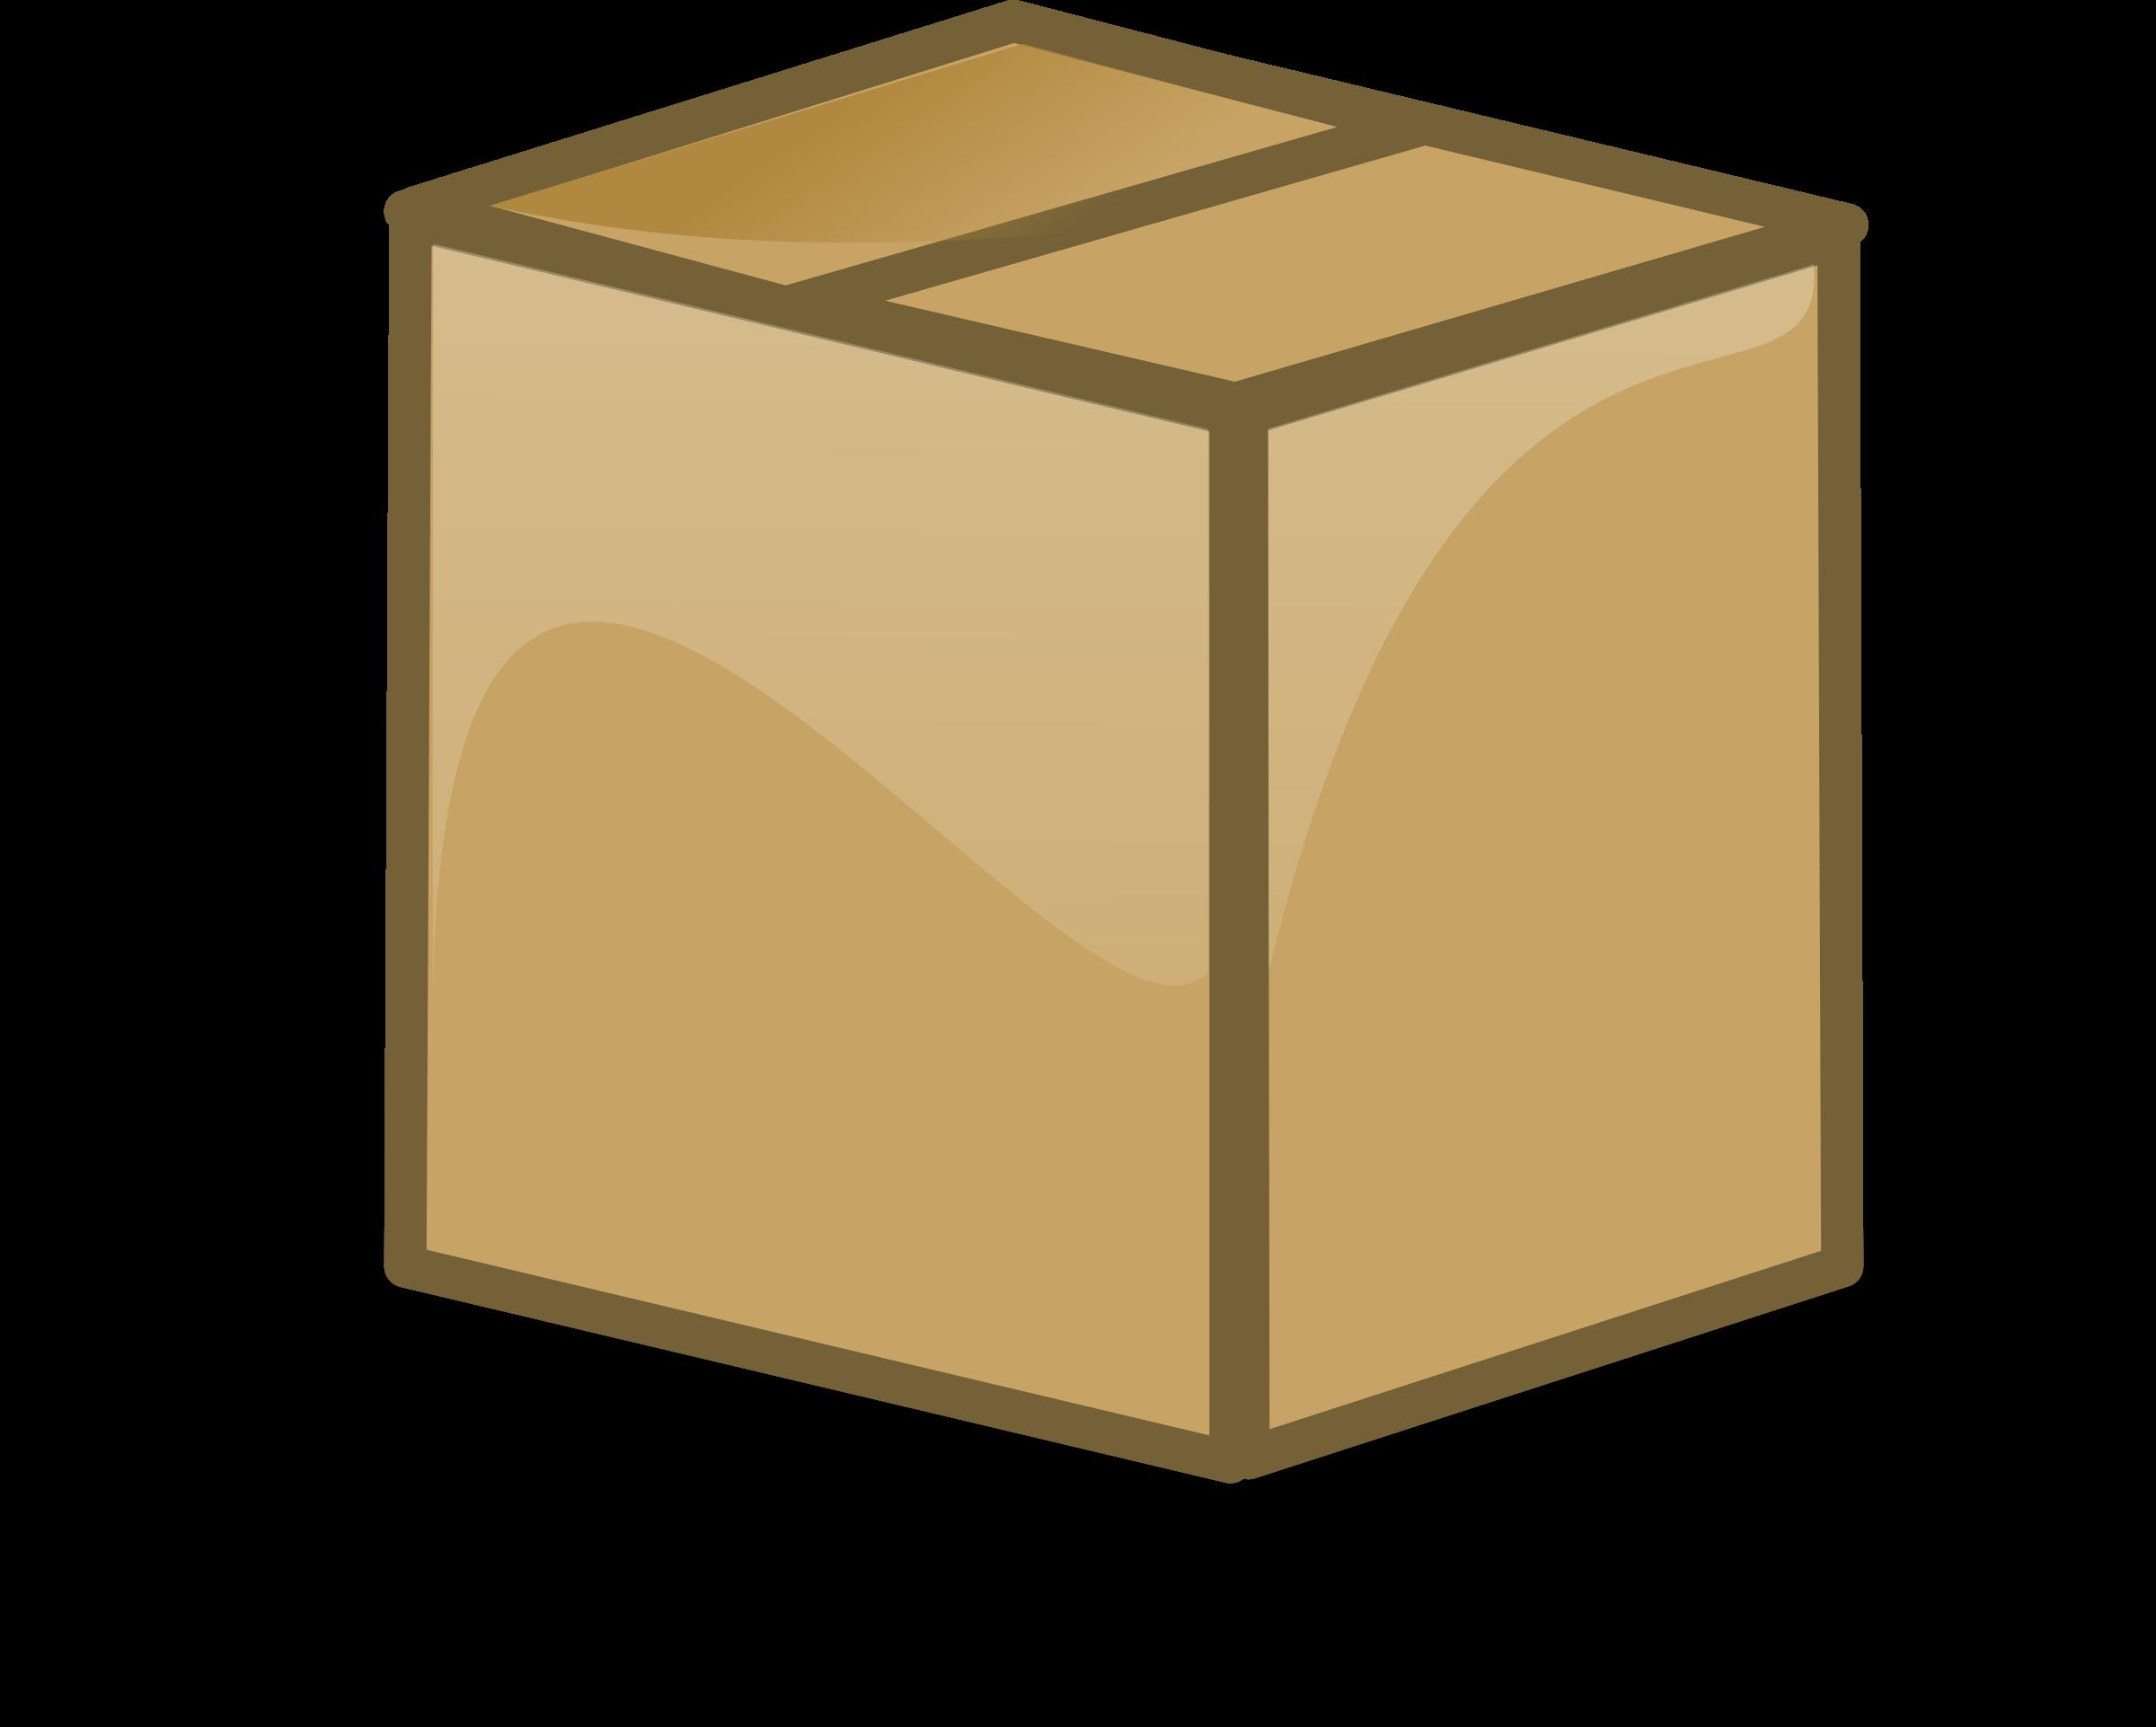 Clipart box carton box. Closed